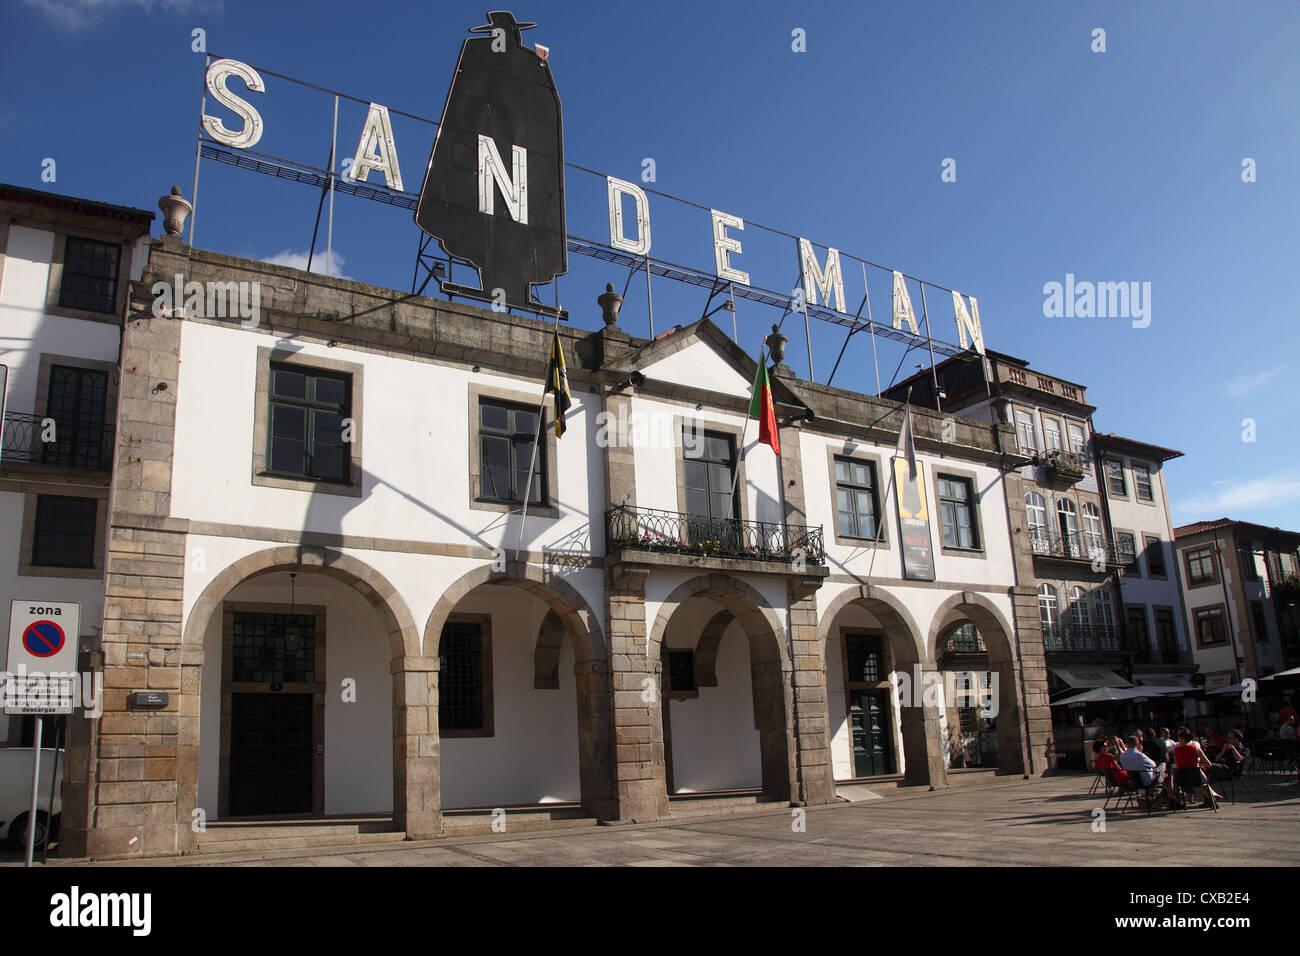 Sandeman Port Wine Lodge, Vila Nova de Gaia, Porto, Douro, Portugal, Europe - Stock Image